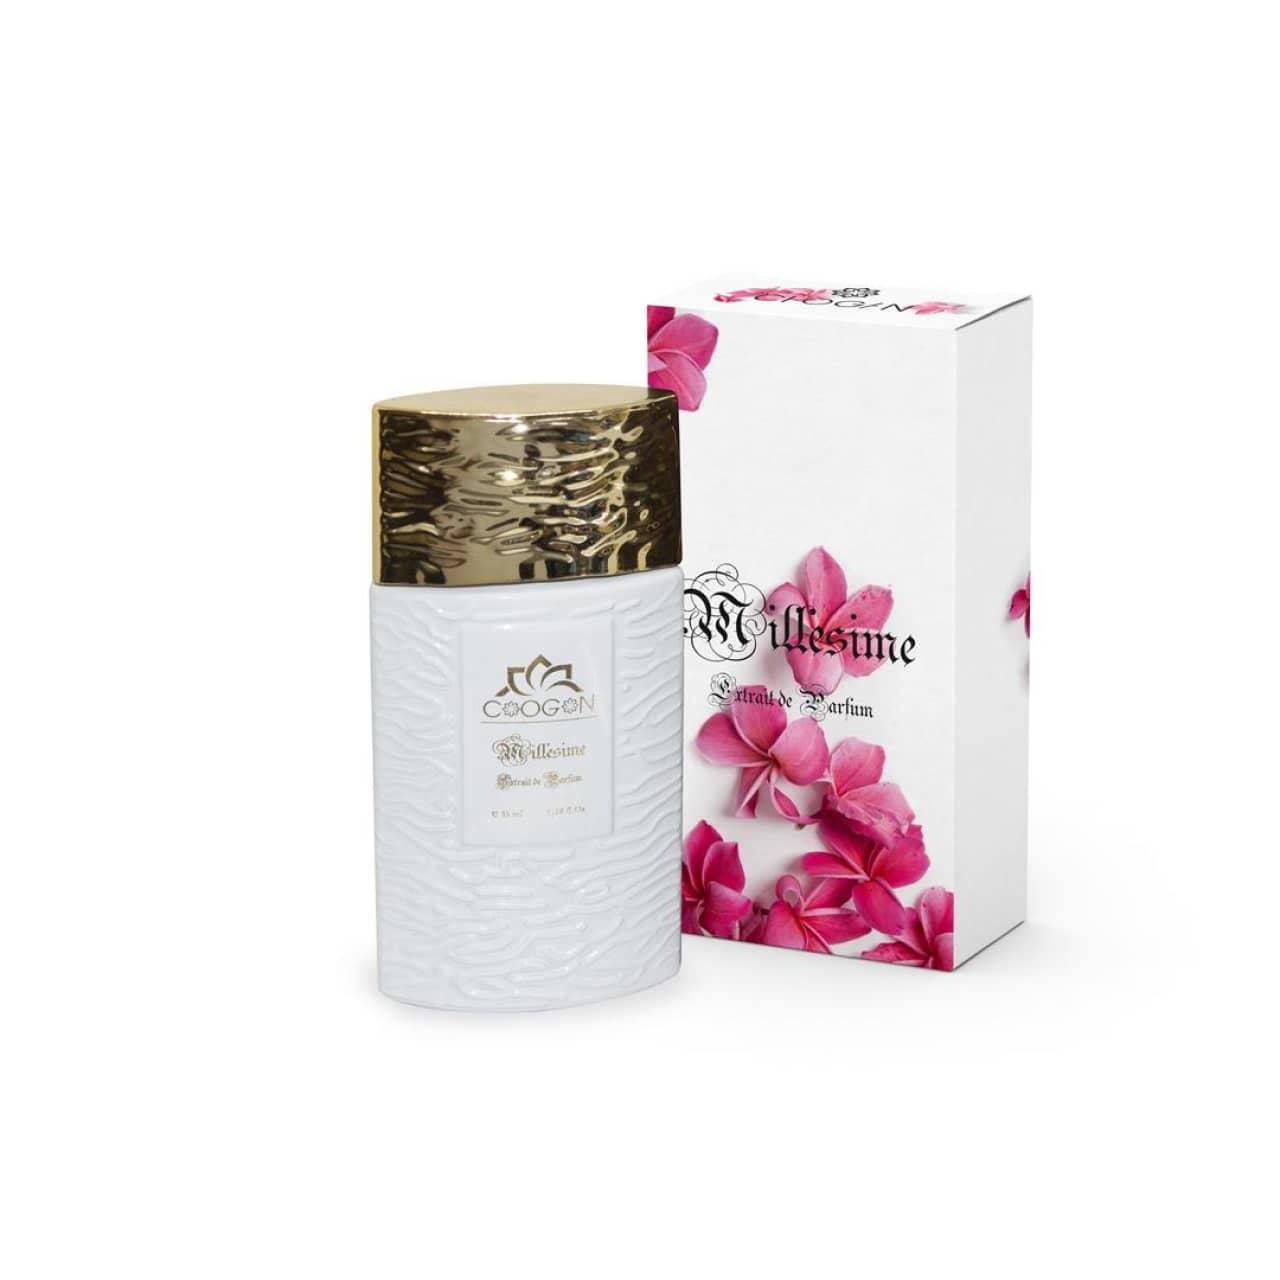 Parfum femme code 026 20ml